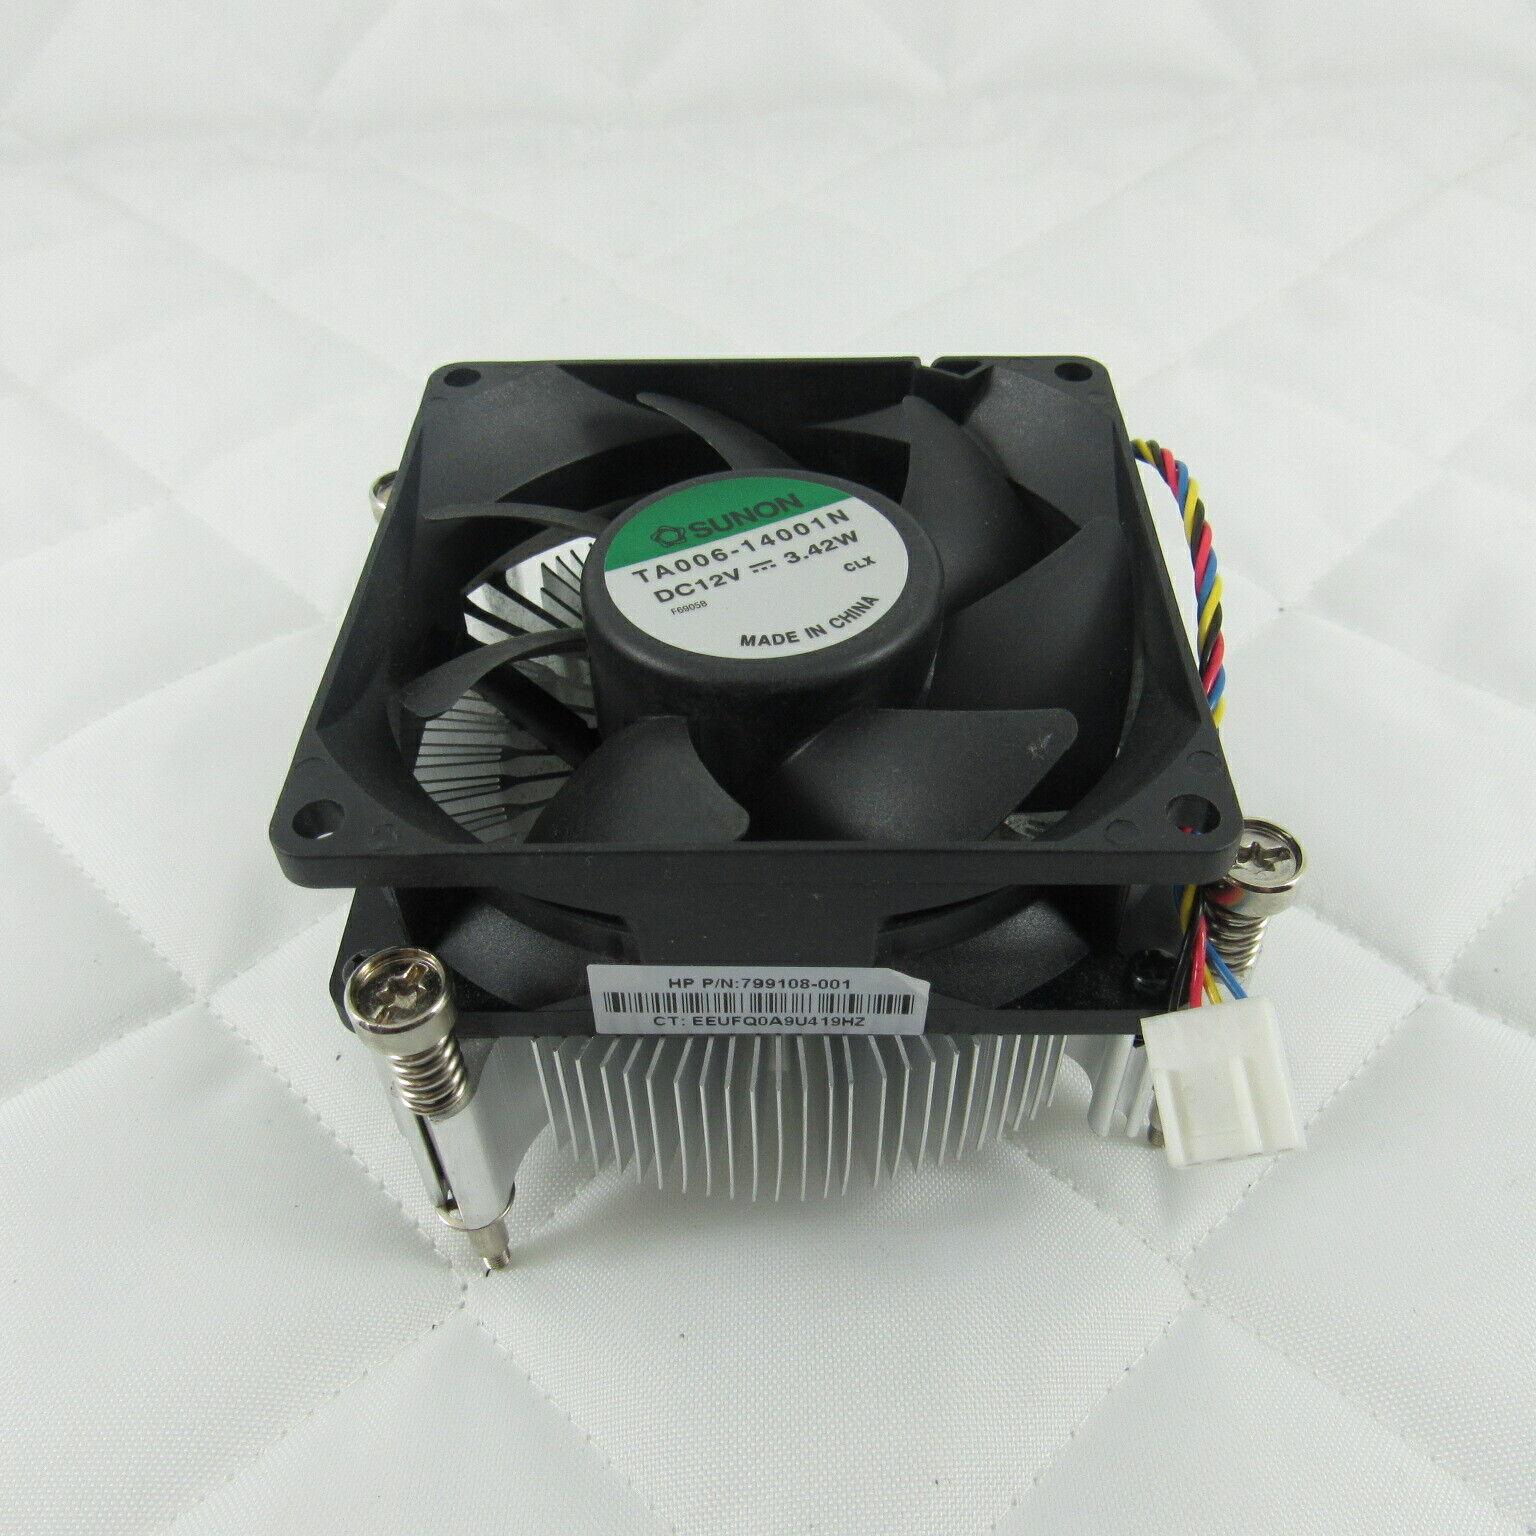 Image 1 - HP-PRODESK-400-G3-MINI-TOWER-HEATSINK-AND-FAN-799108-001